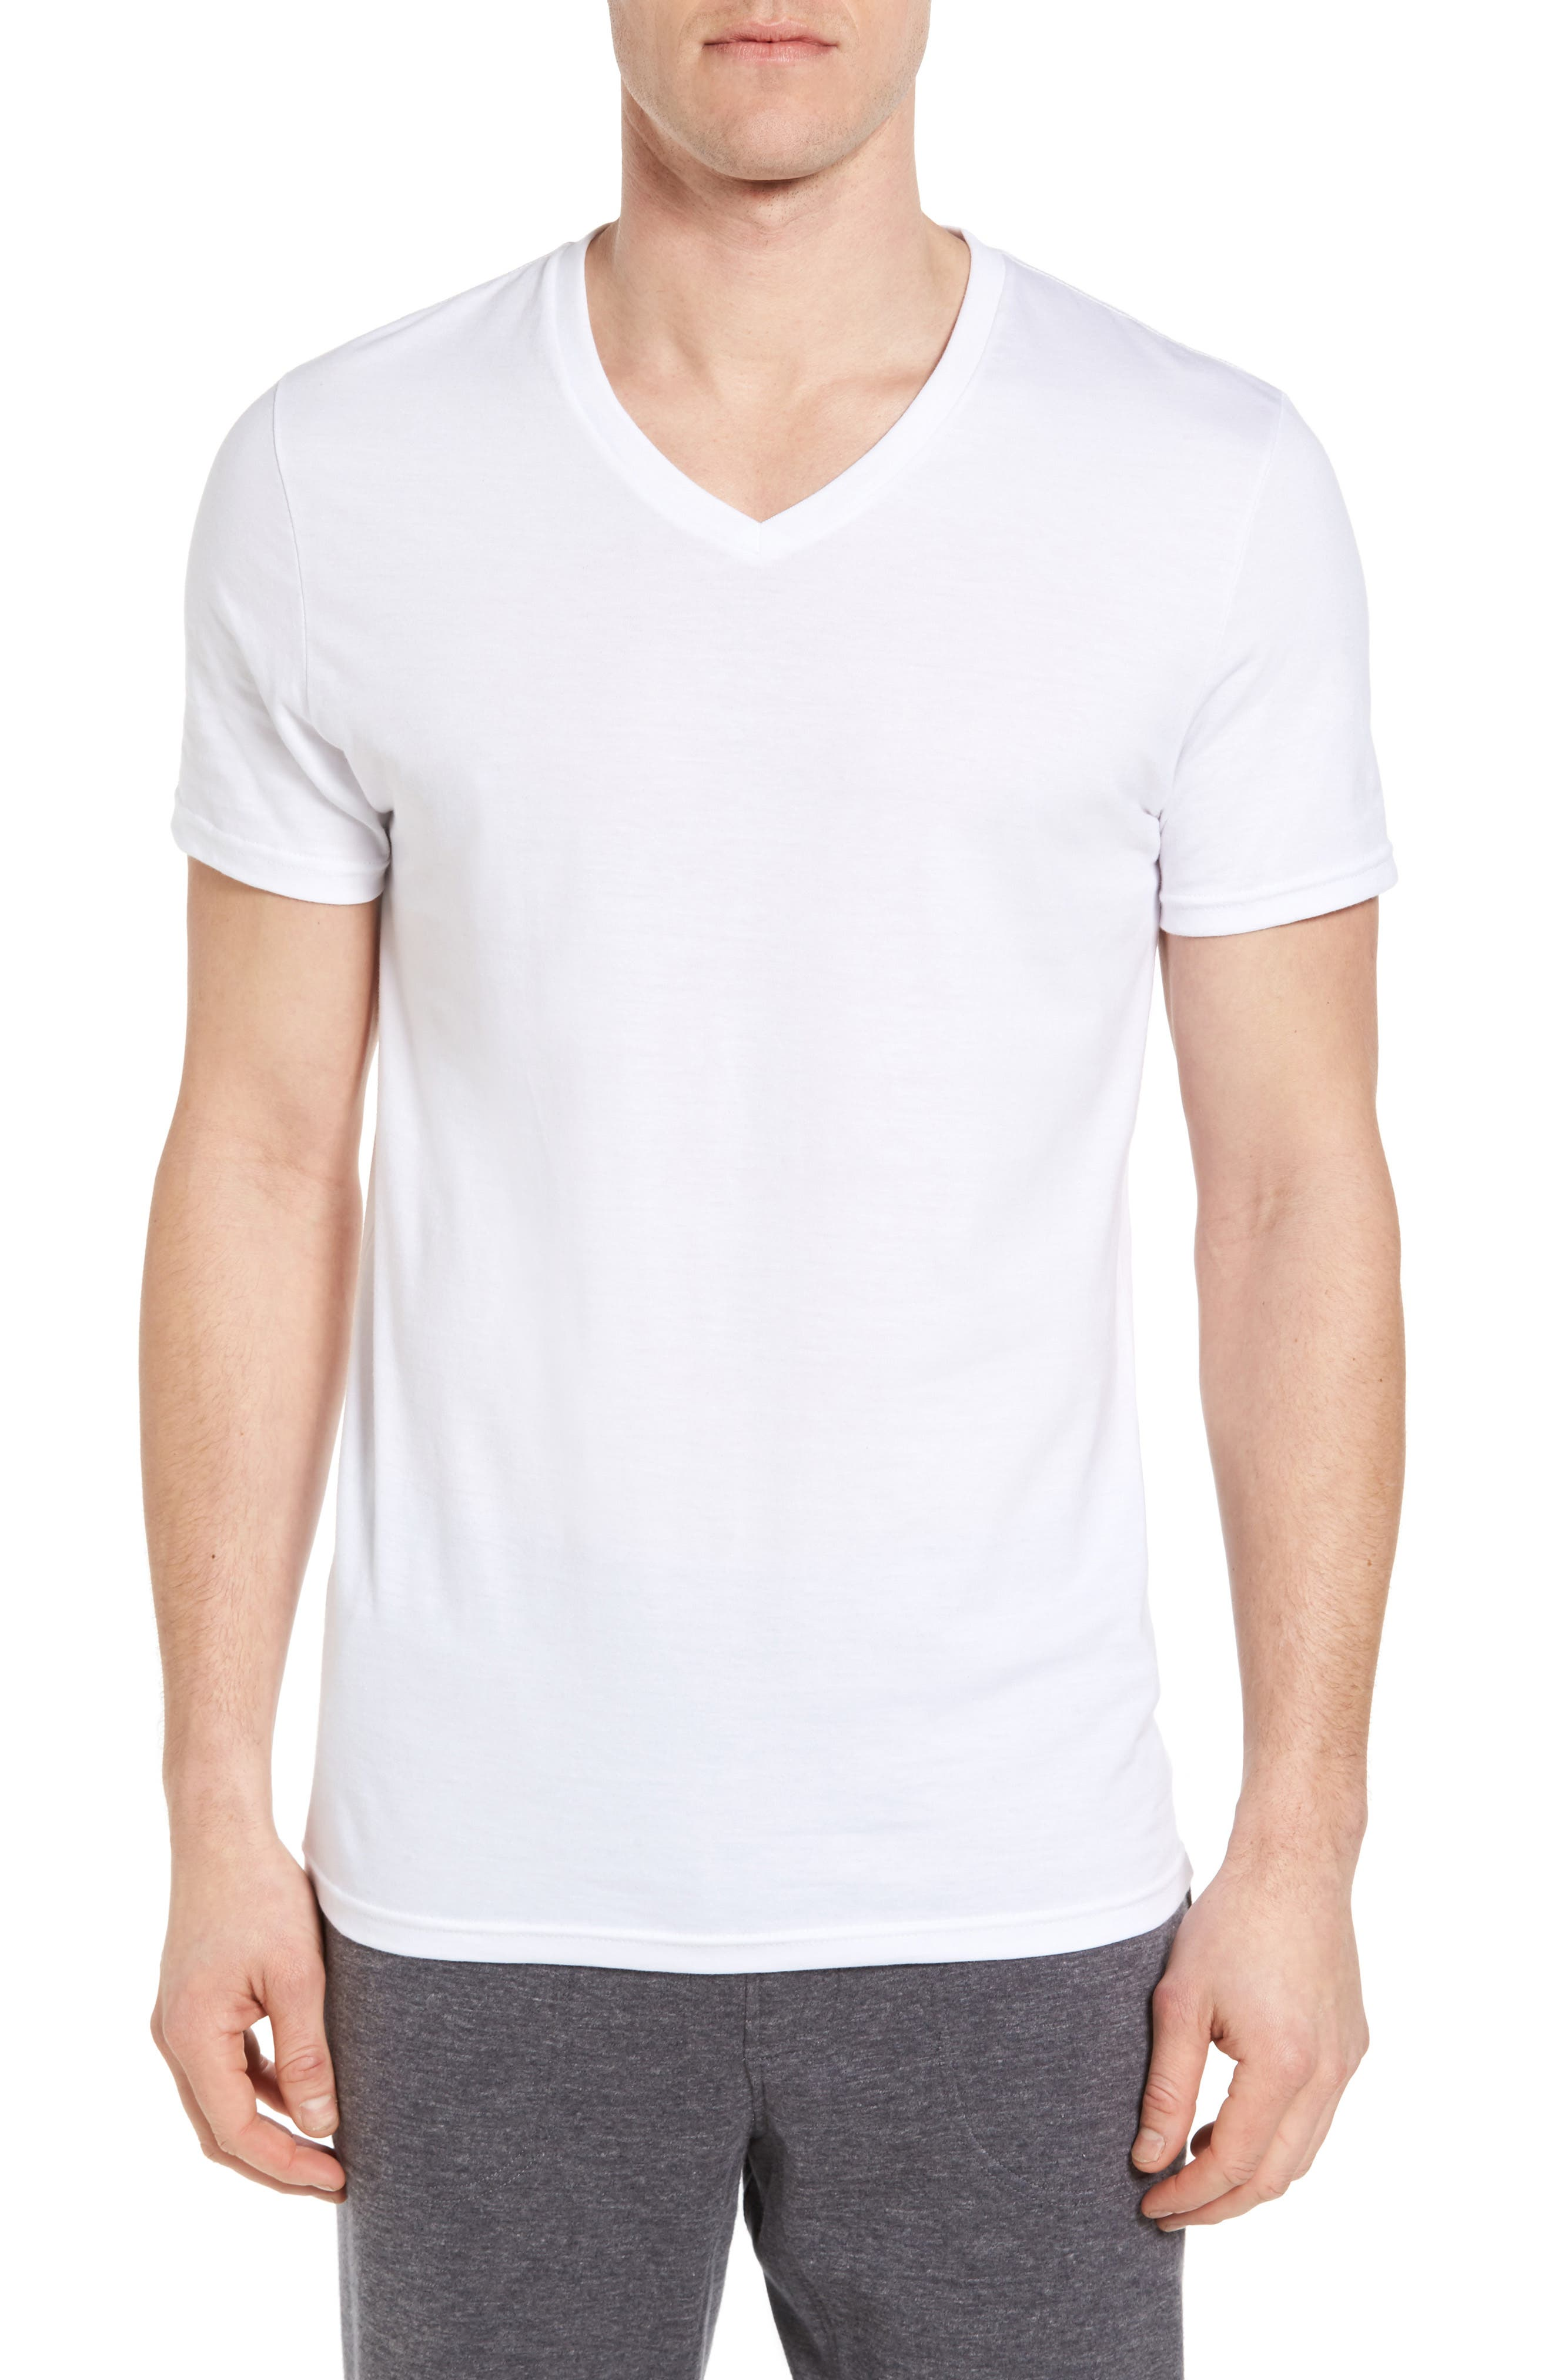 4-Pack Trim Fit Supima<sup>®</sup> Cotton V-Neck T-Shirts,                             Alternate thumbnail 2, color,                             WHITE